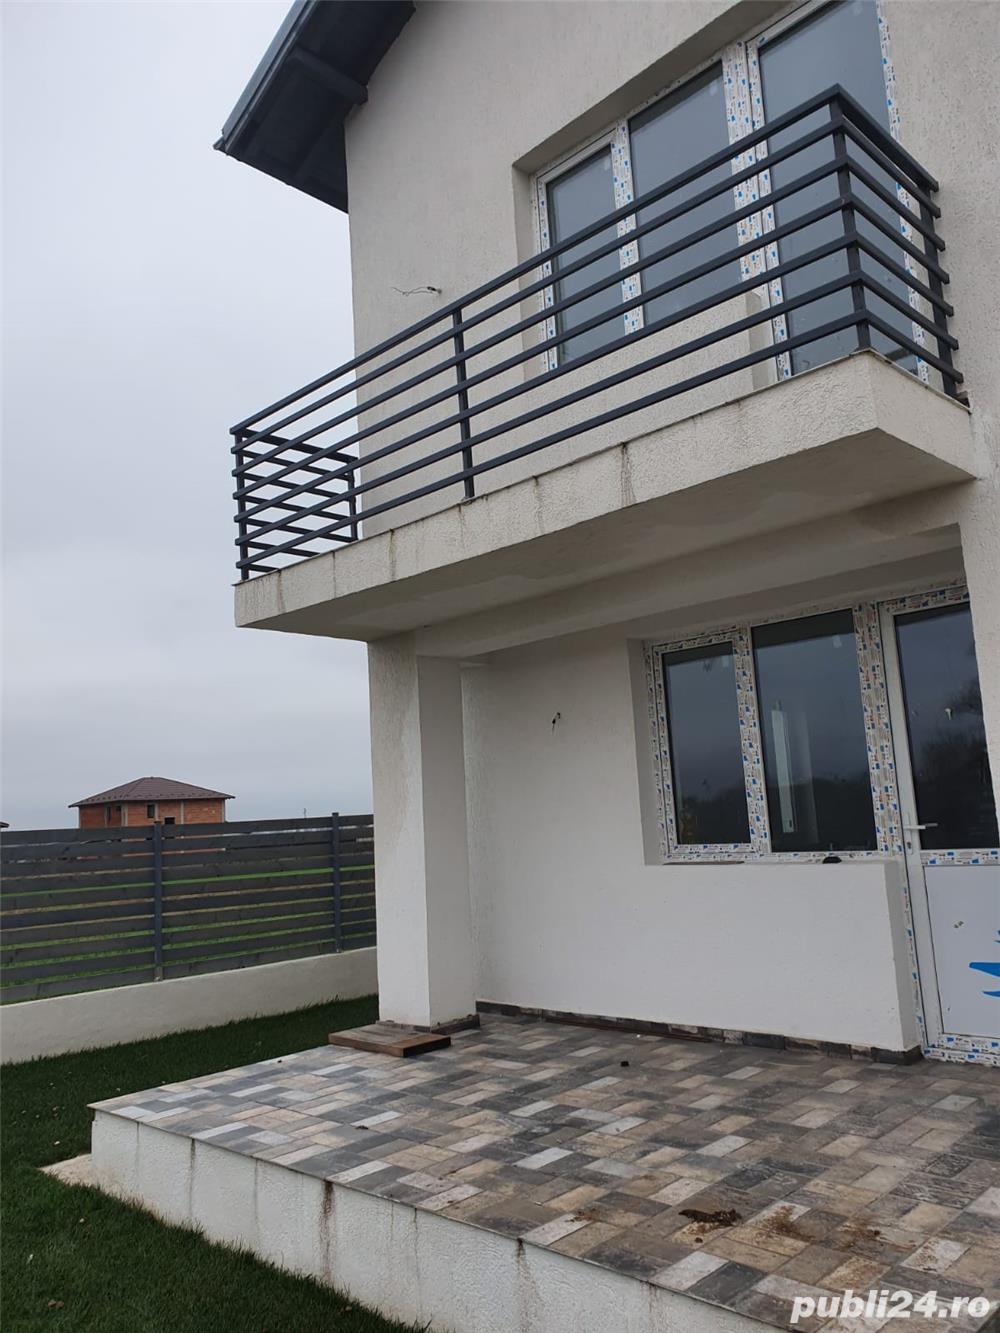 SUPER PRET - Duplex 4 camere si mansarda locuibila, Clinceni, Poze reale - ultima unitate